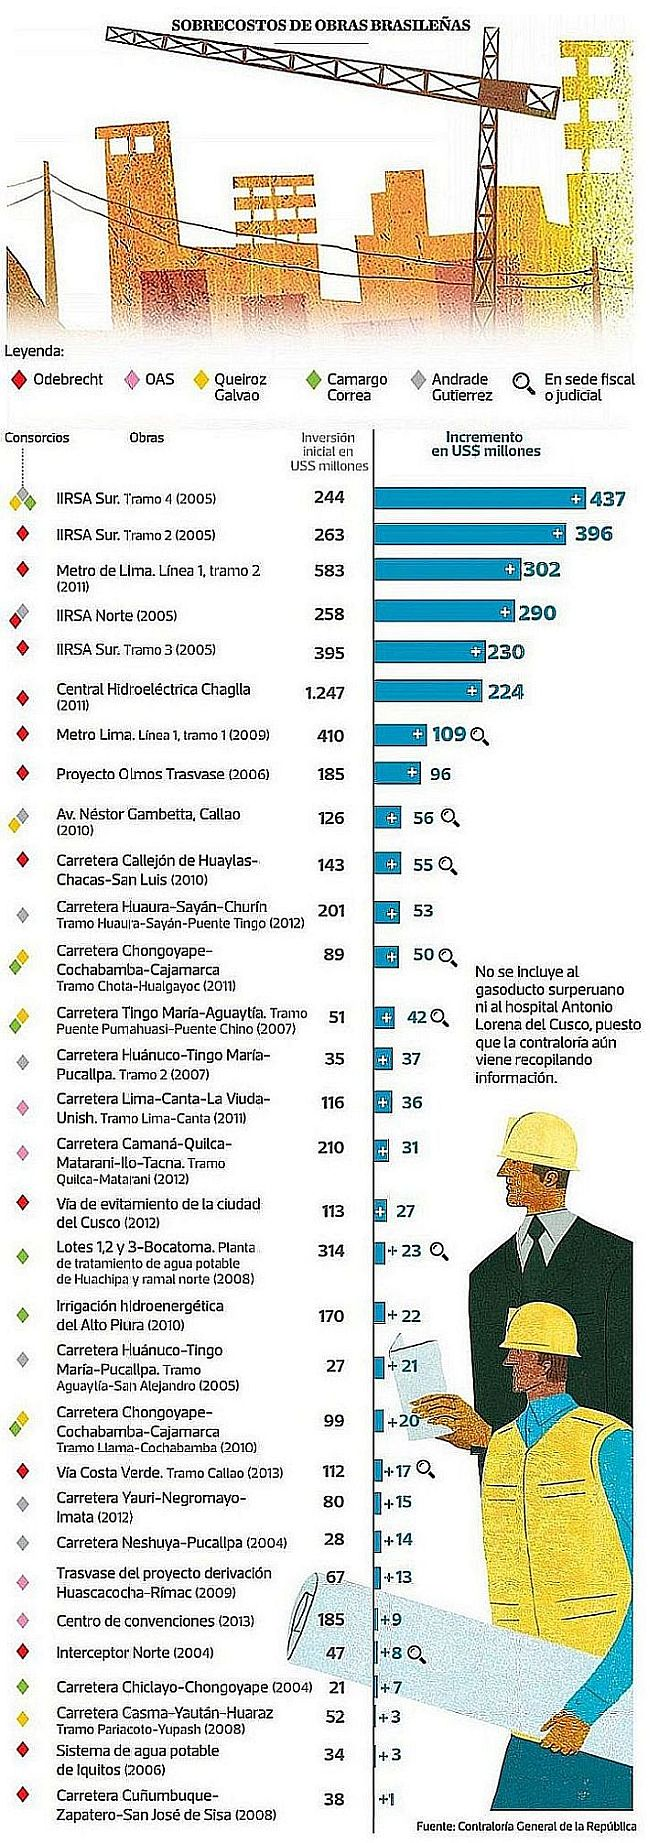 [Foto] Lava Jato: investigan diez obras de cinco empresas brasileñas